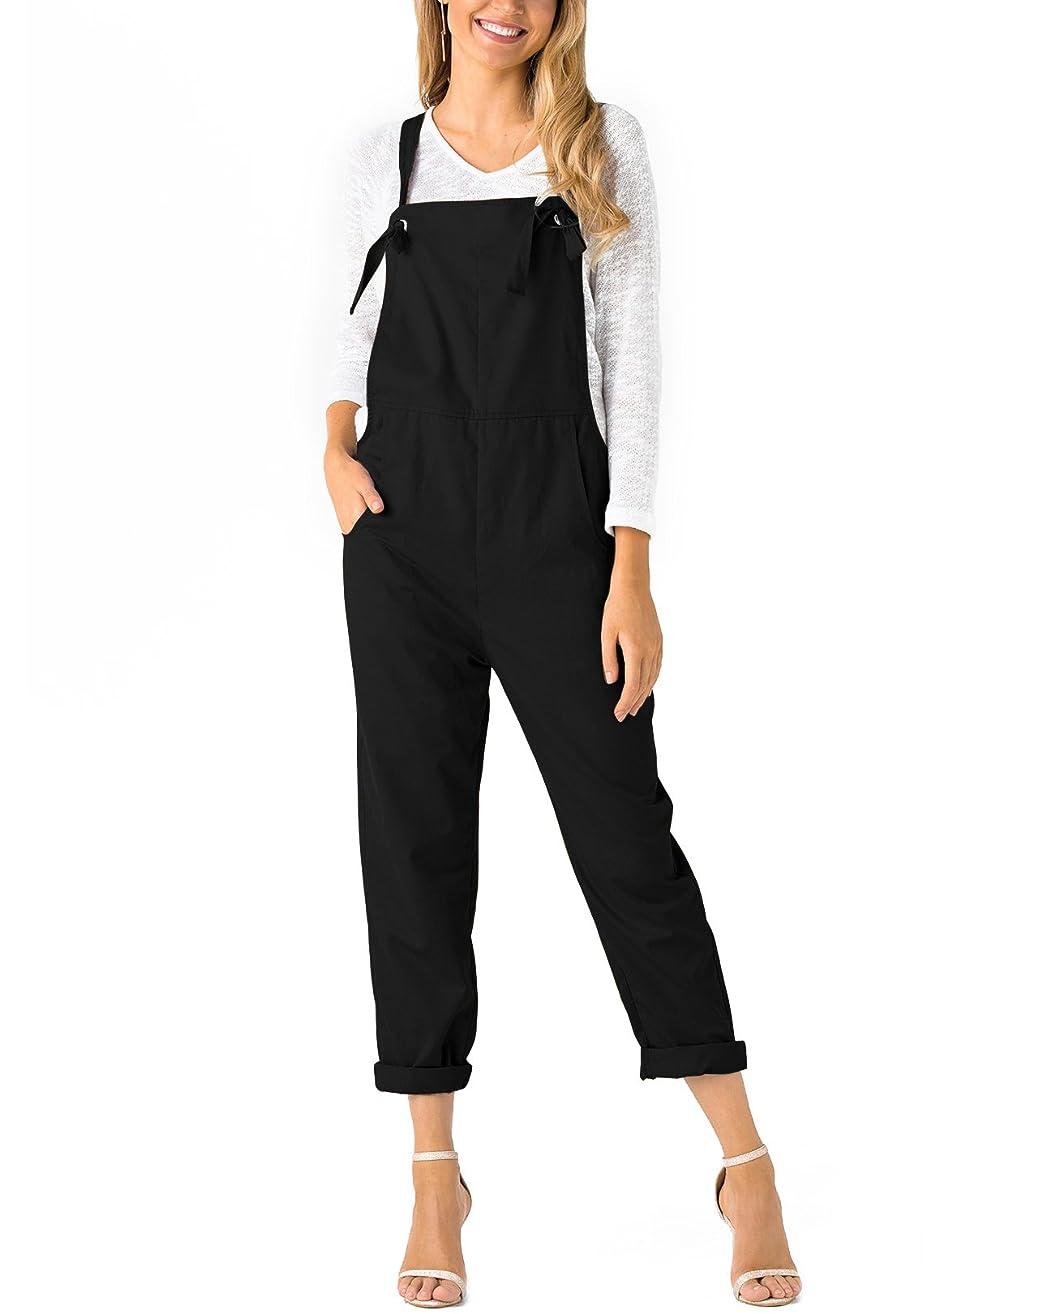 YOINS Women Fashion Overalls Bib Baggy Dungaree Adjustable Strap Romper Jumpsuit